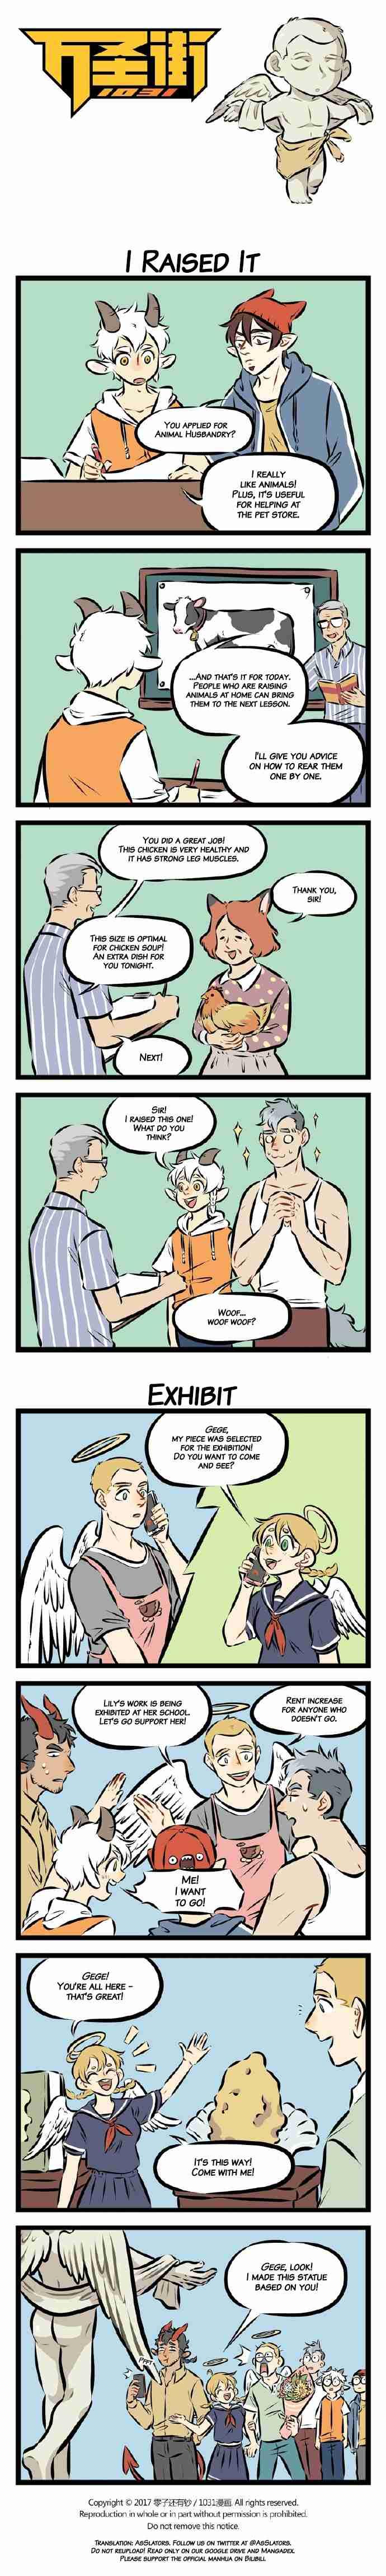 https://img2.nineanime.com/comics/pic4/52/37172/1677050/d80f1f9d6b7d30df67ed49f1deee94d9.jpg Page 1